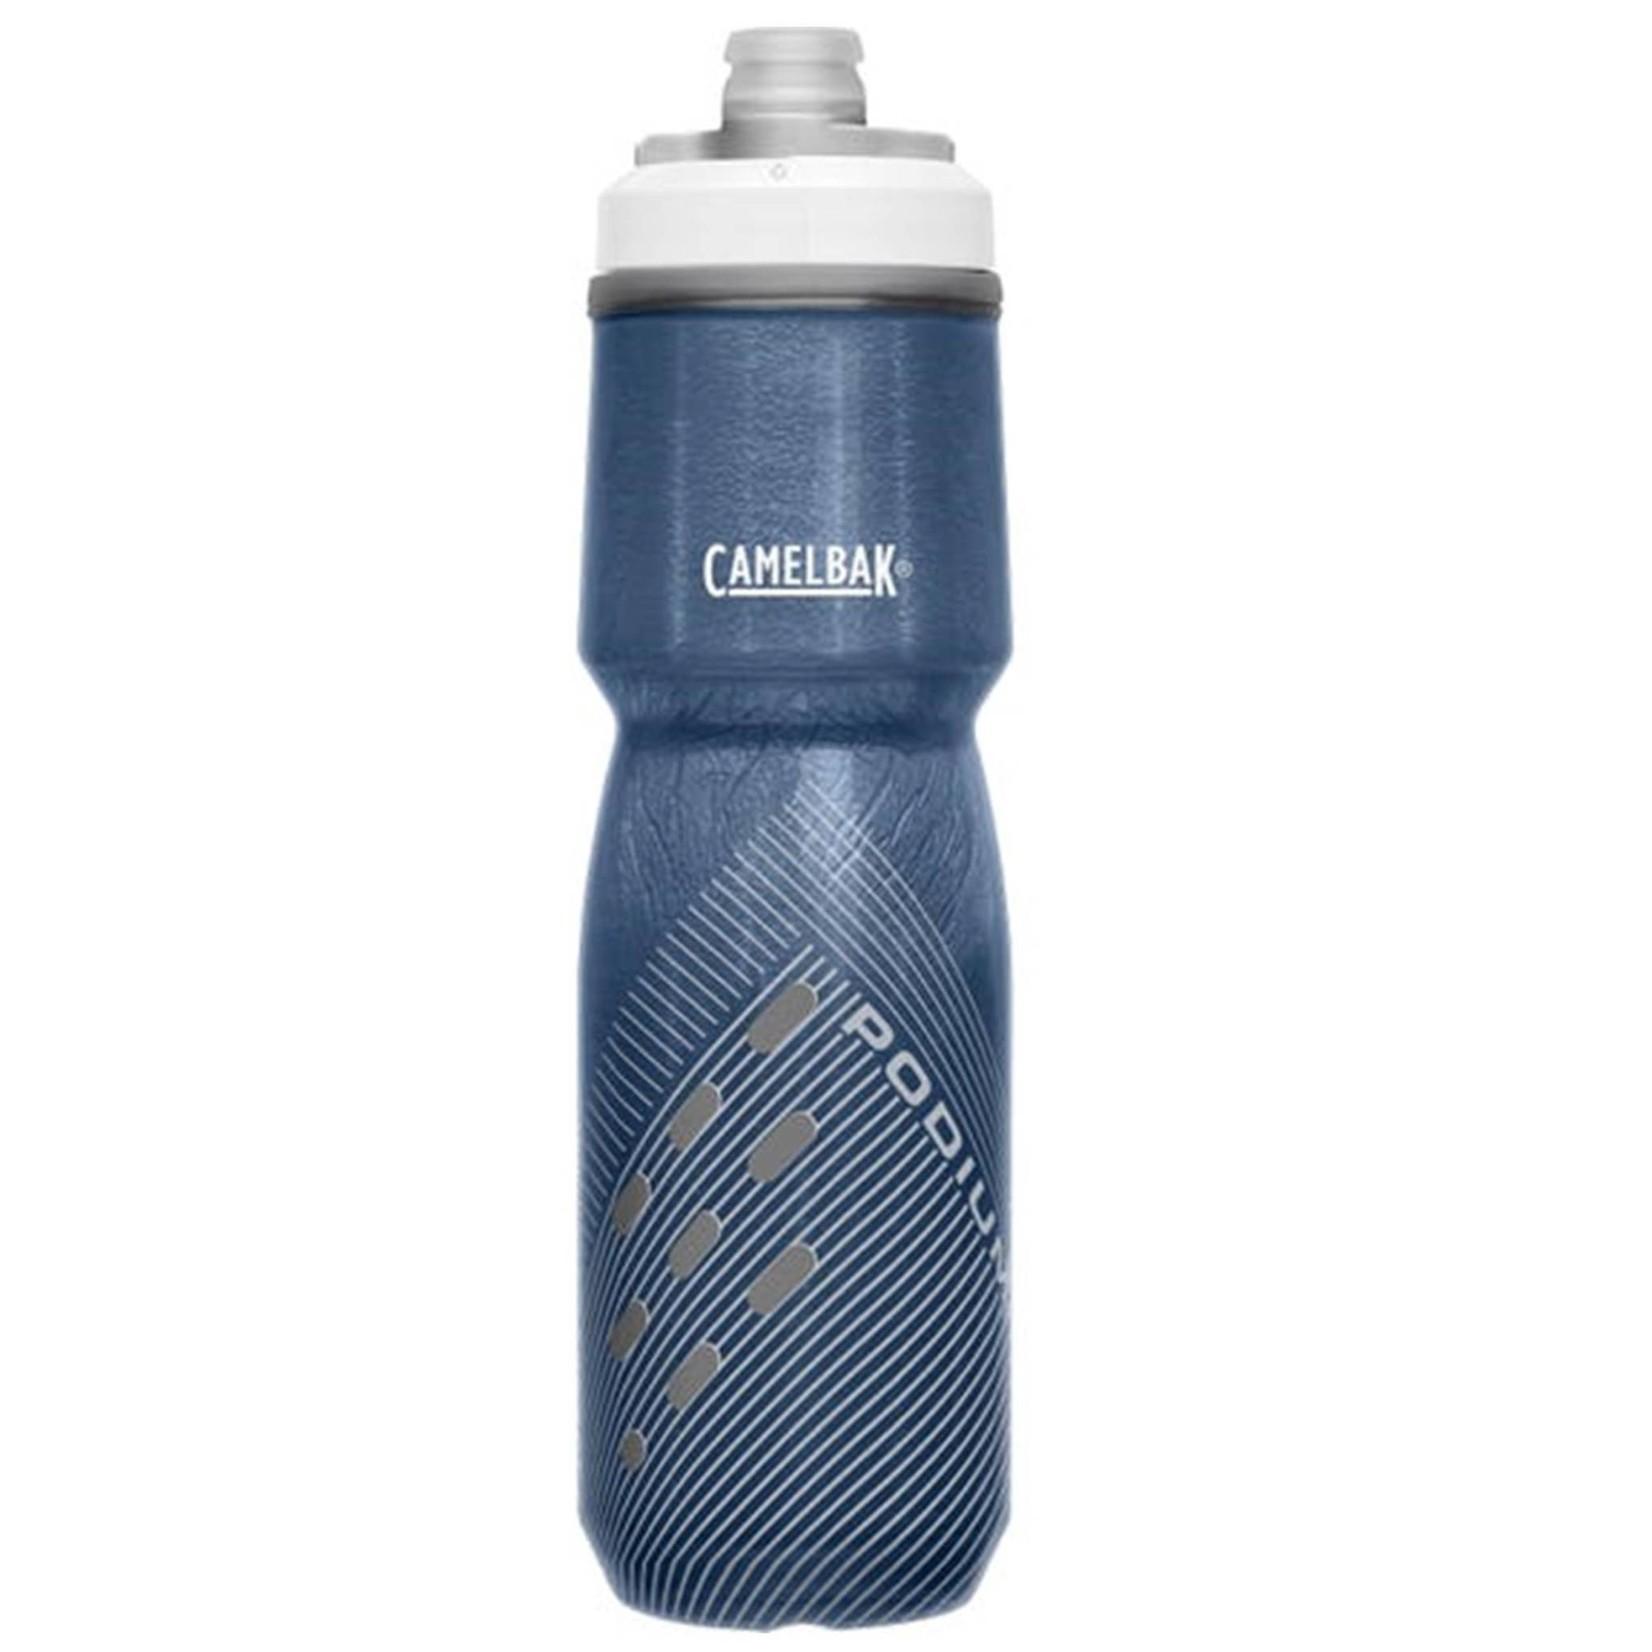 Camelbak Podium Big Chill Water Bottle Navy Perf 710ml